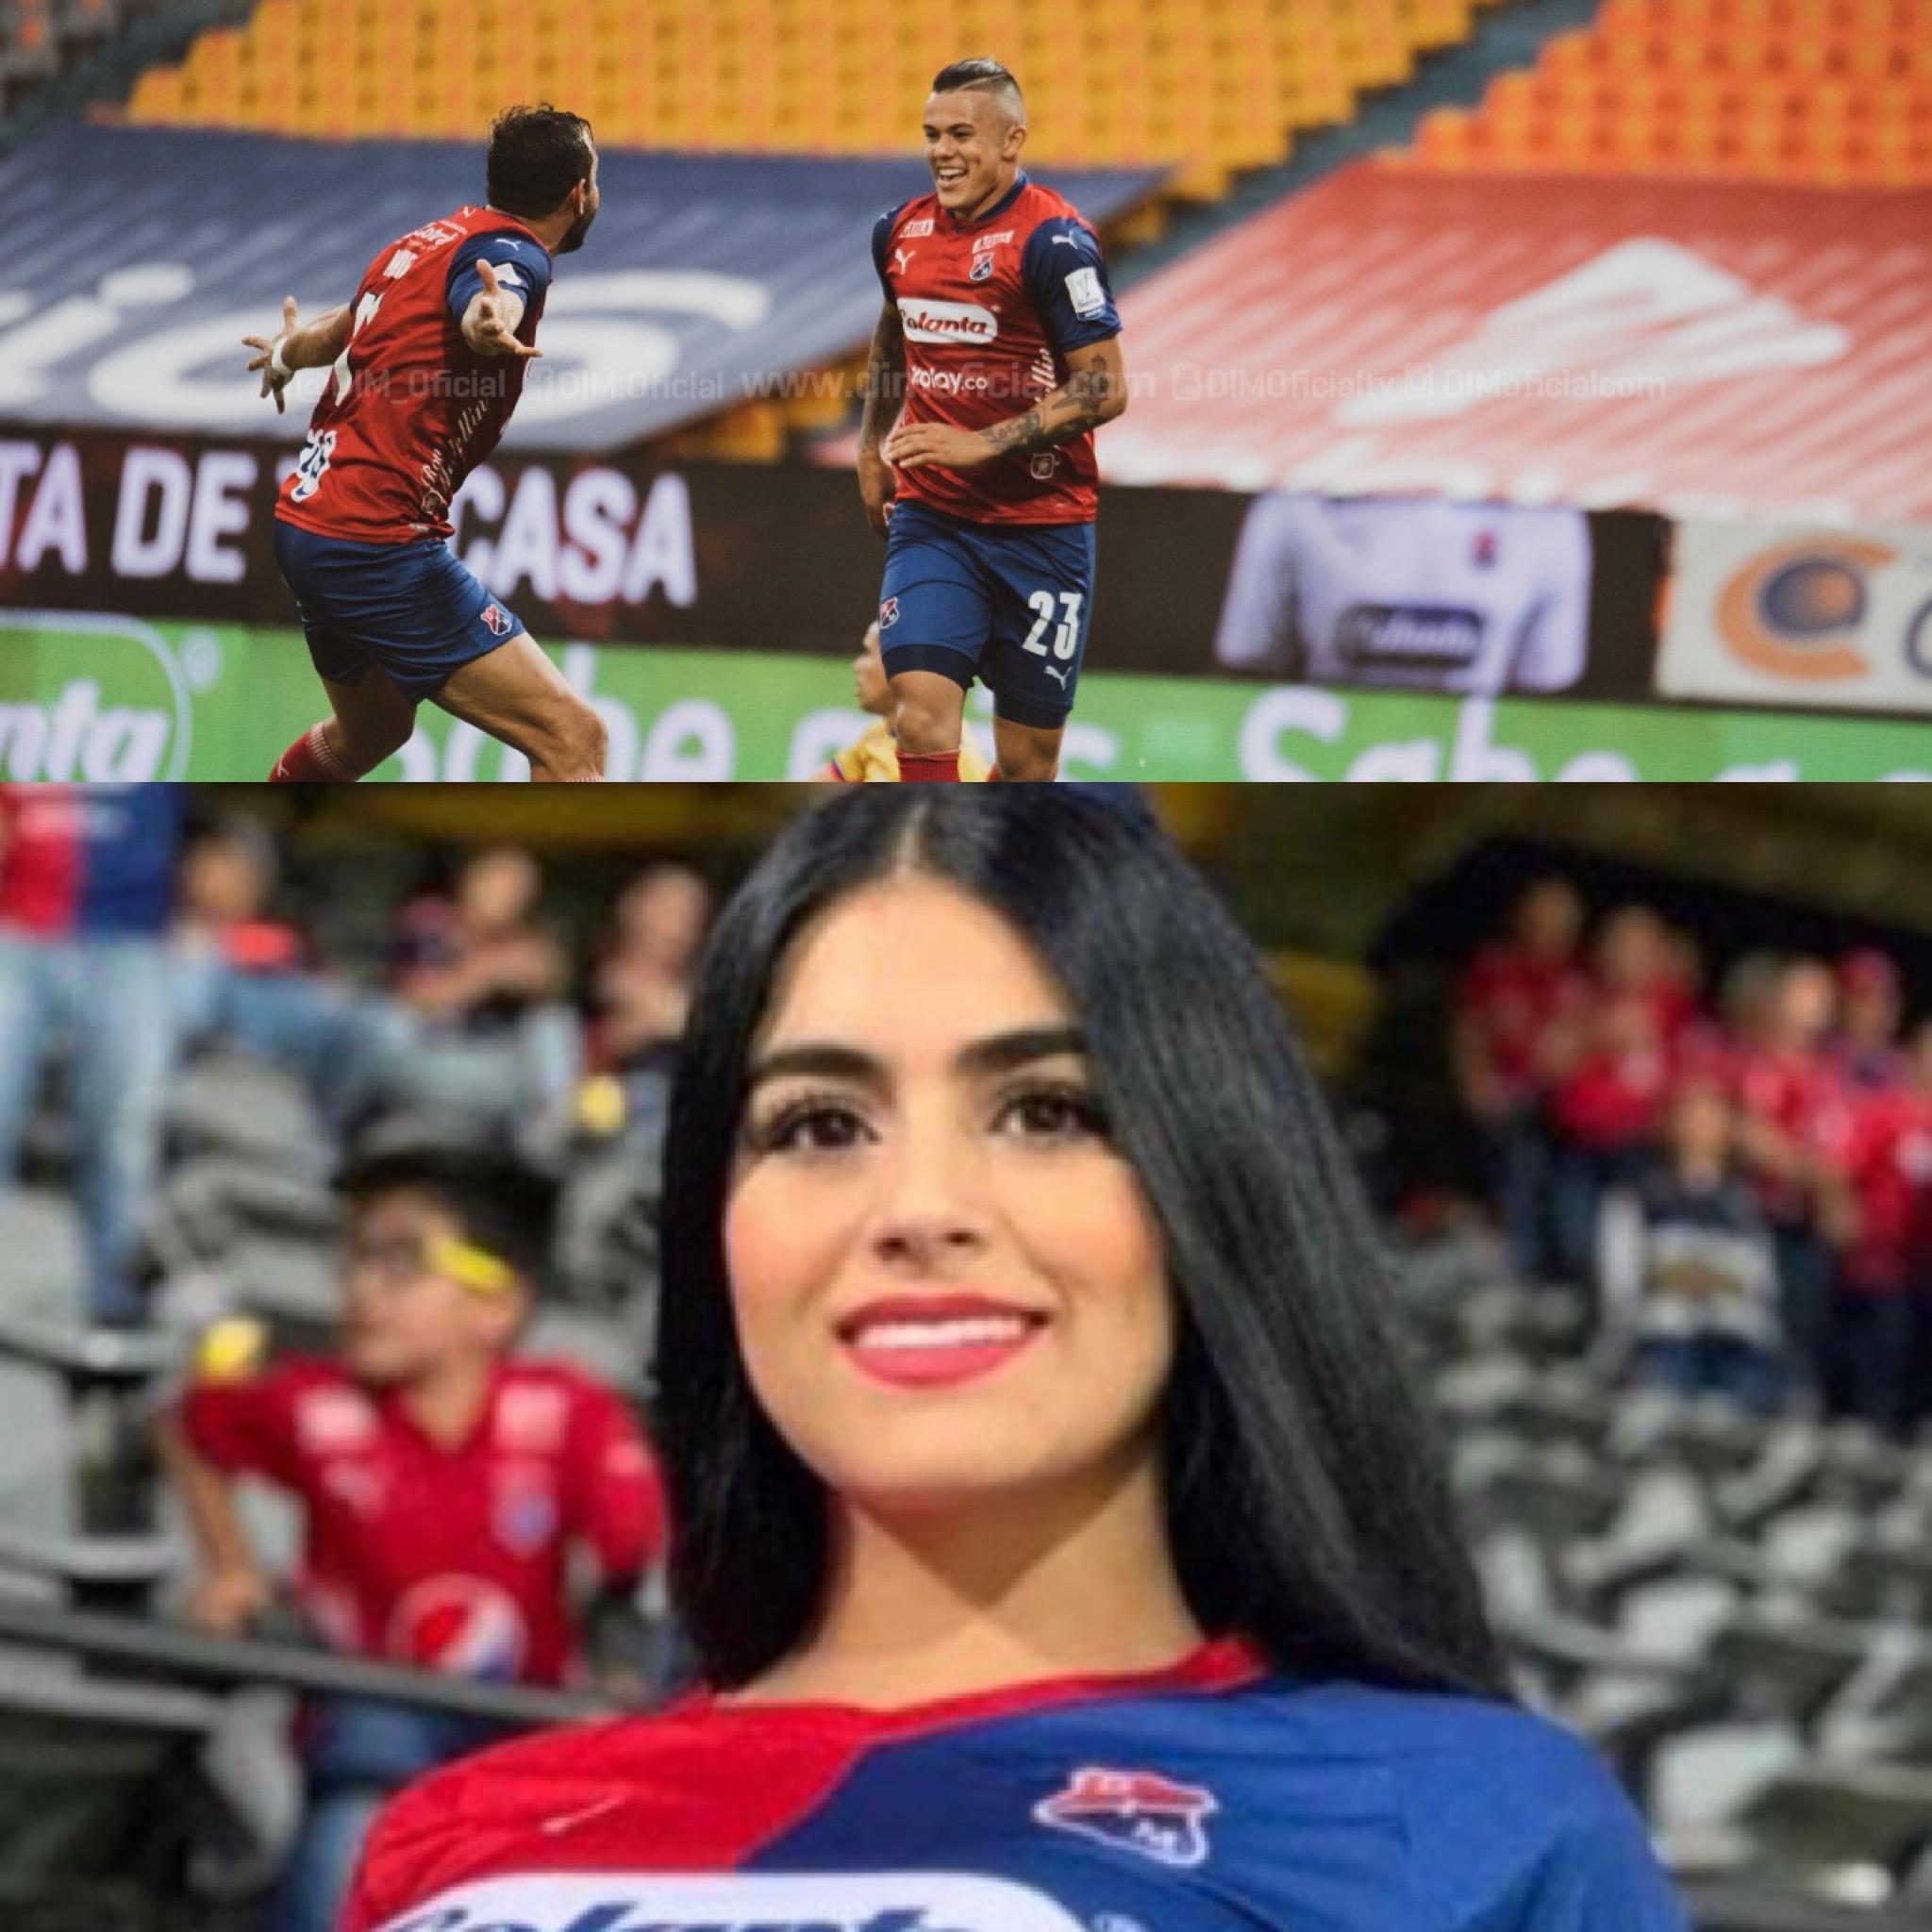 ¡A cumplir! Leo Castro ya hizo gol, sigue la parte de la modelo Valeria Giraldo